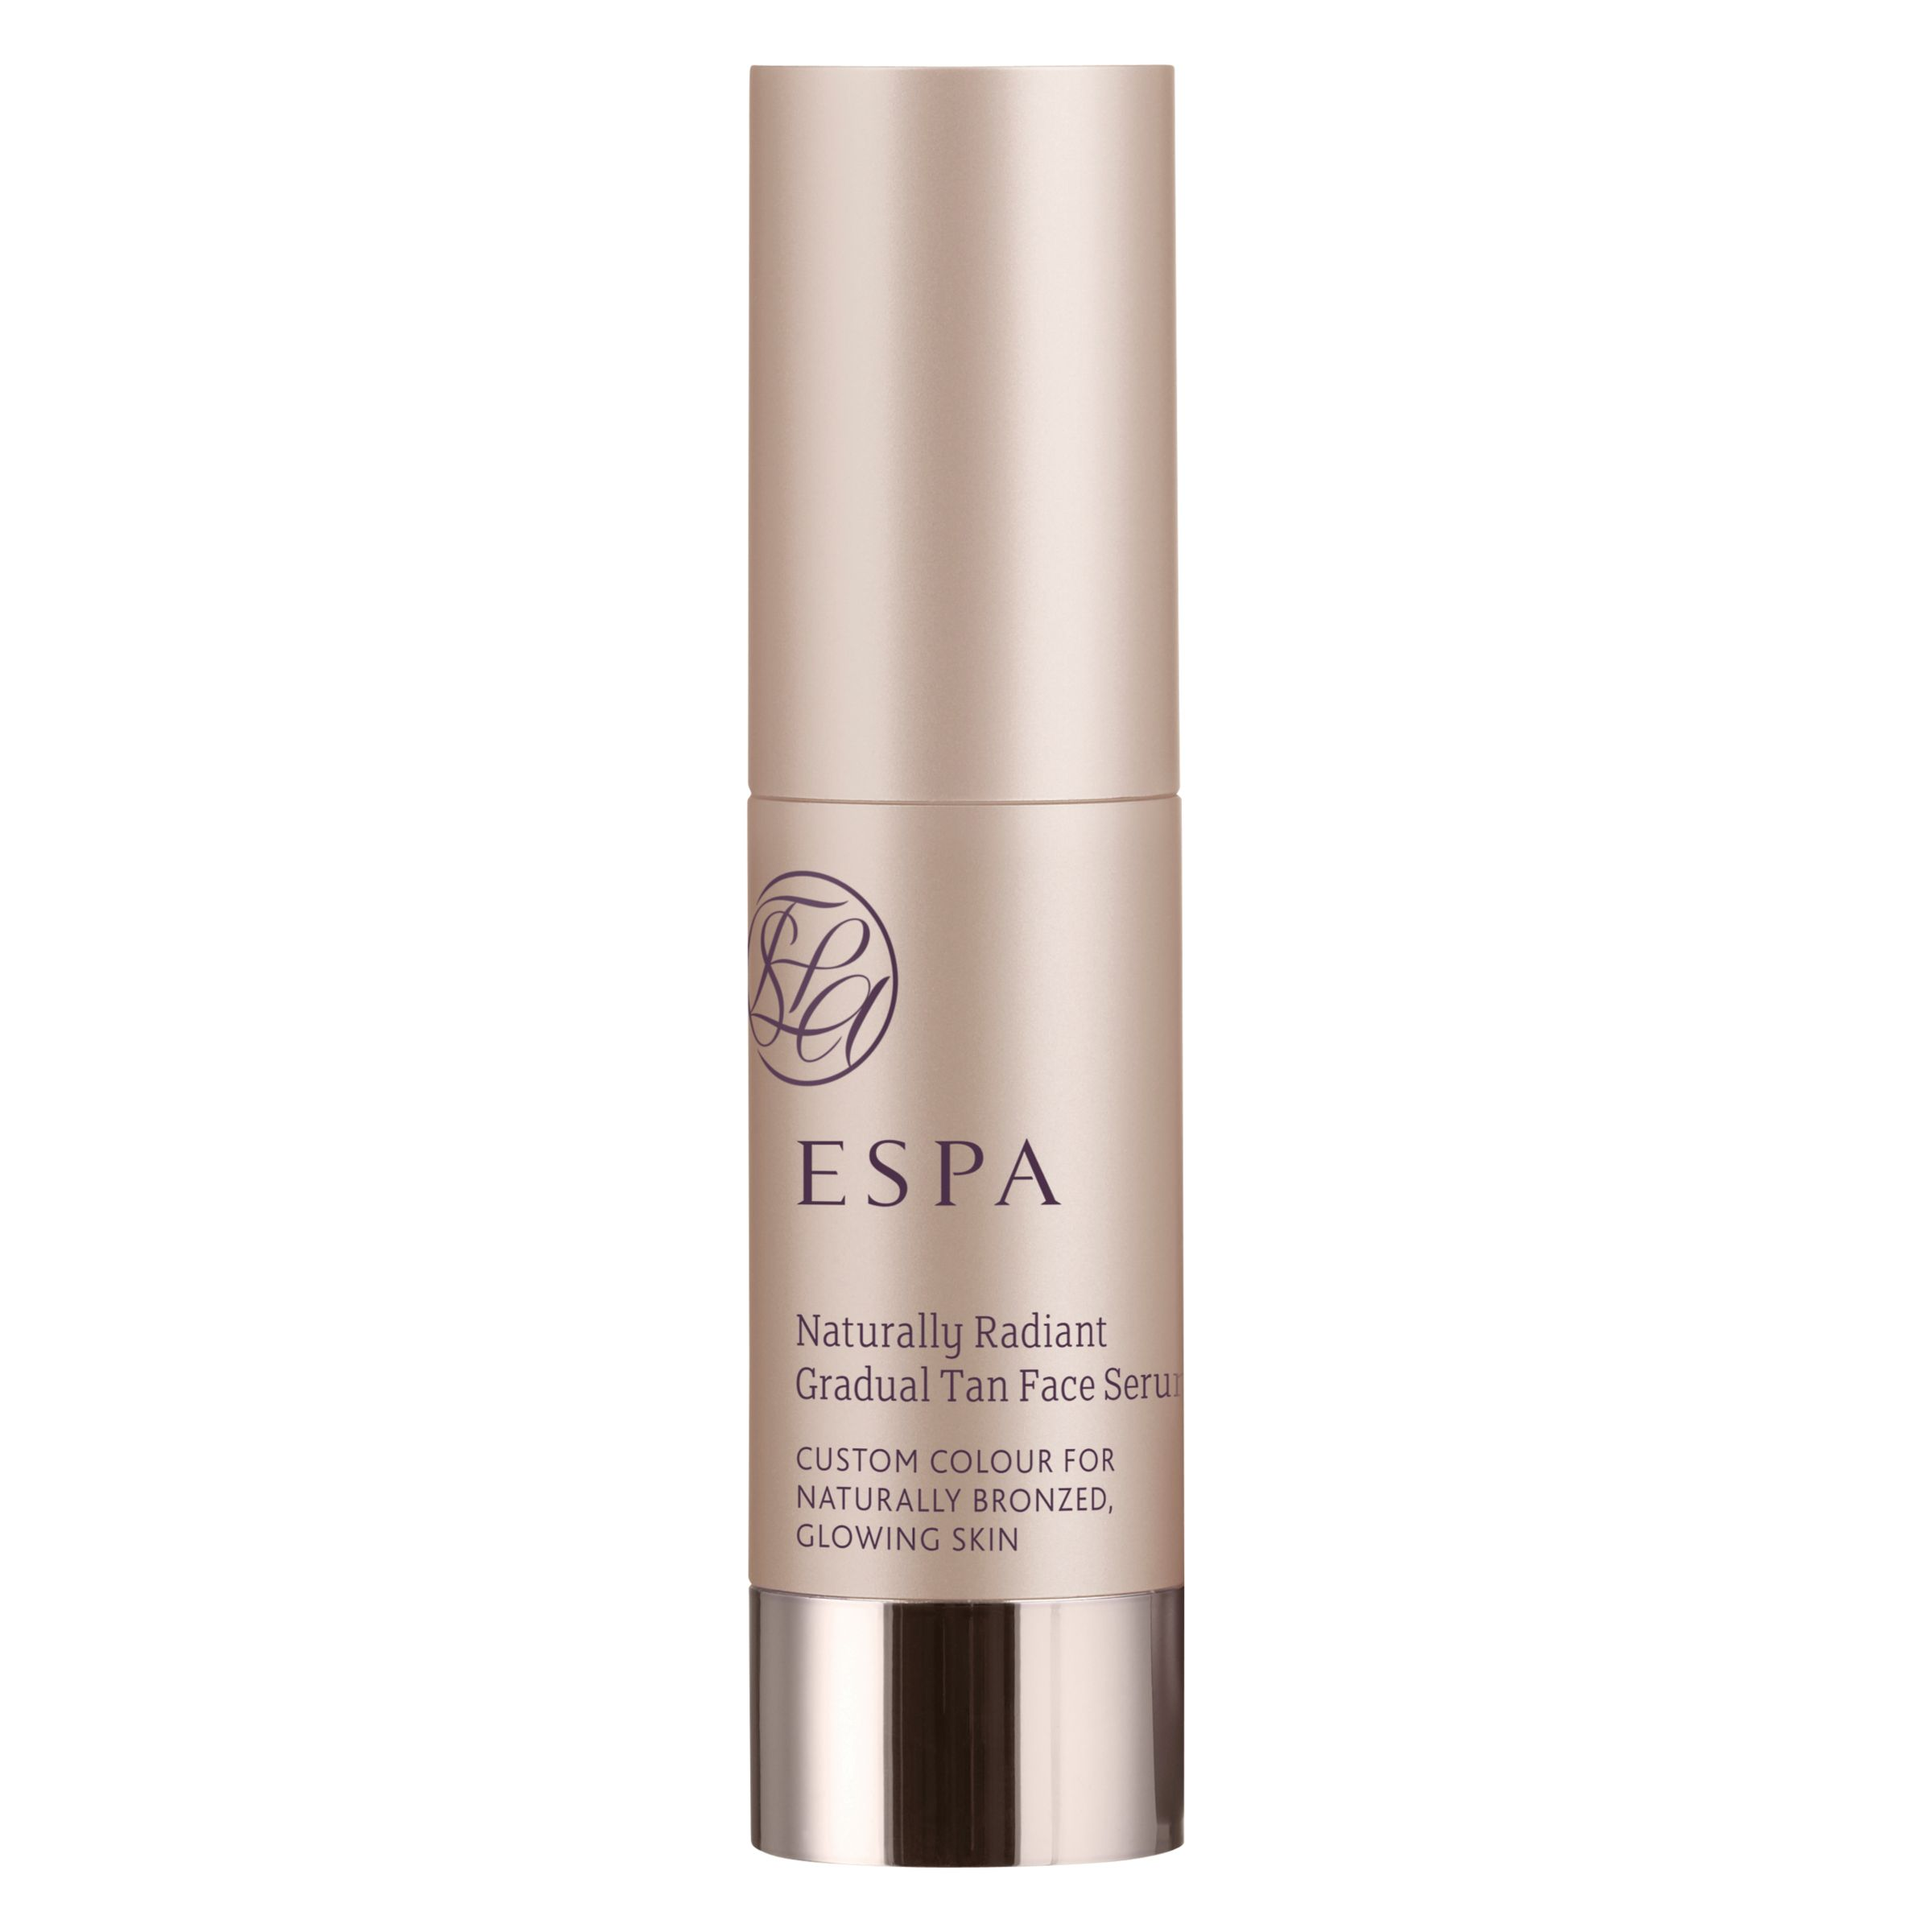 ESPA ESPA Naturally Radiant Gradual Tan Face Serum, 15ml